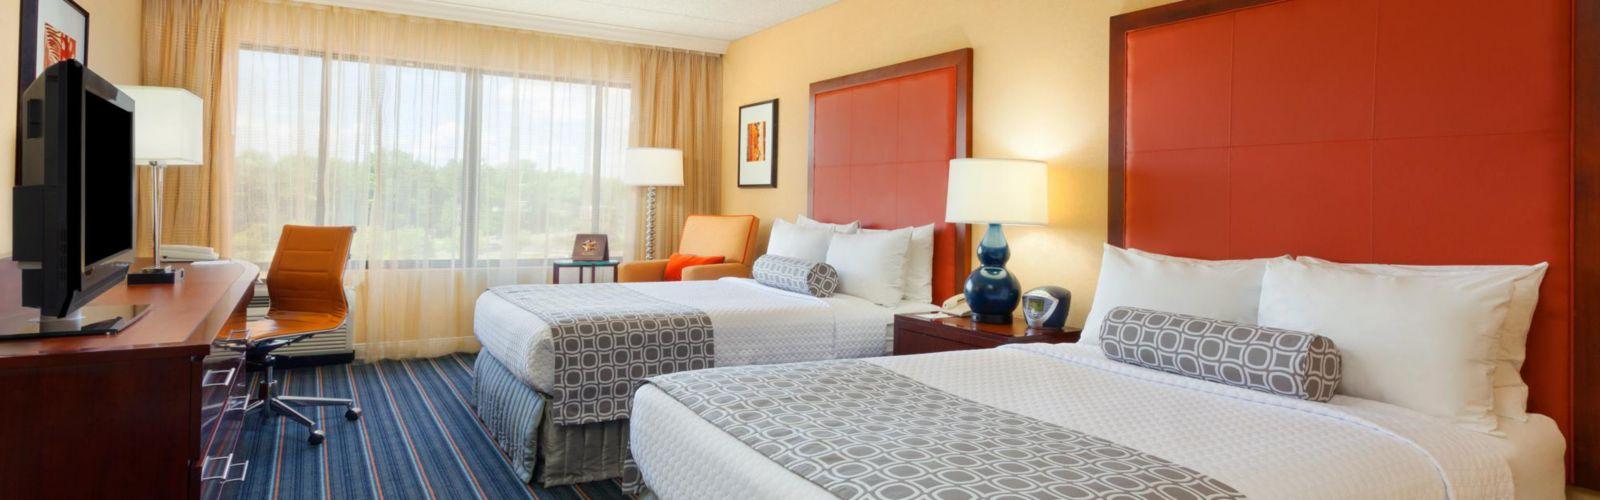 Rooms & Suites